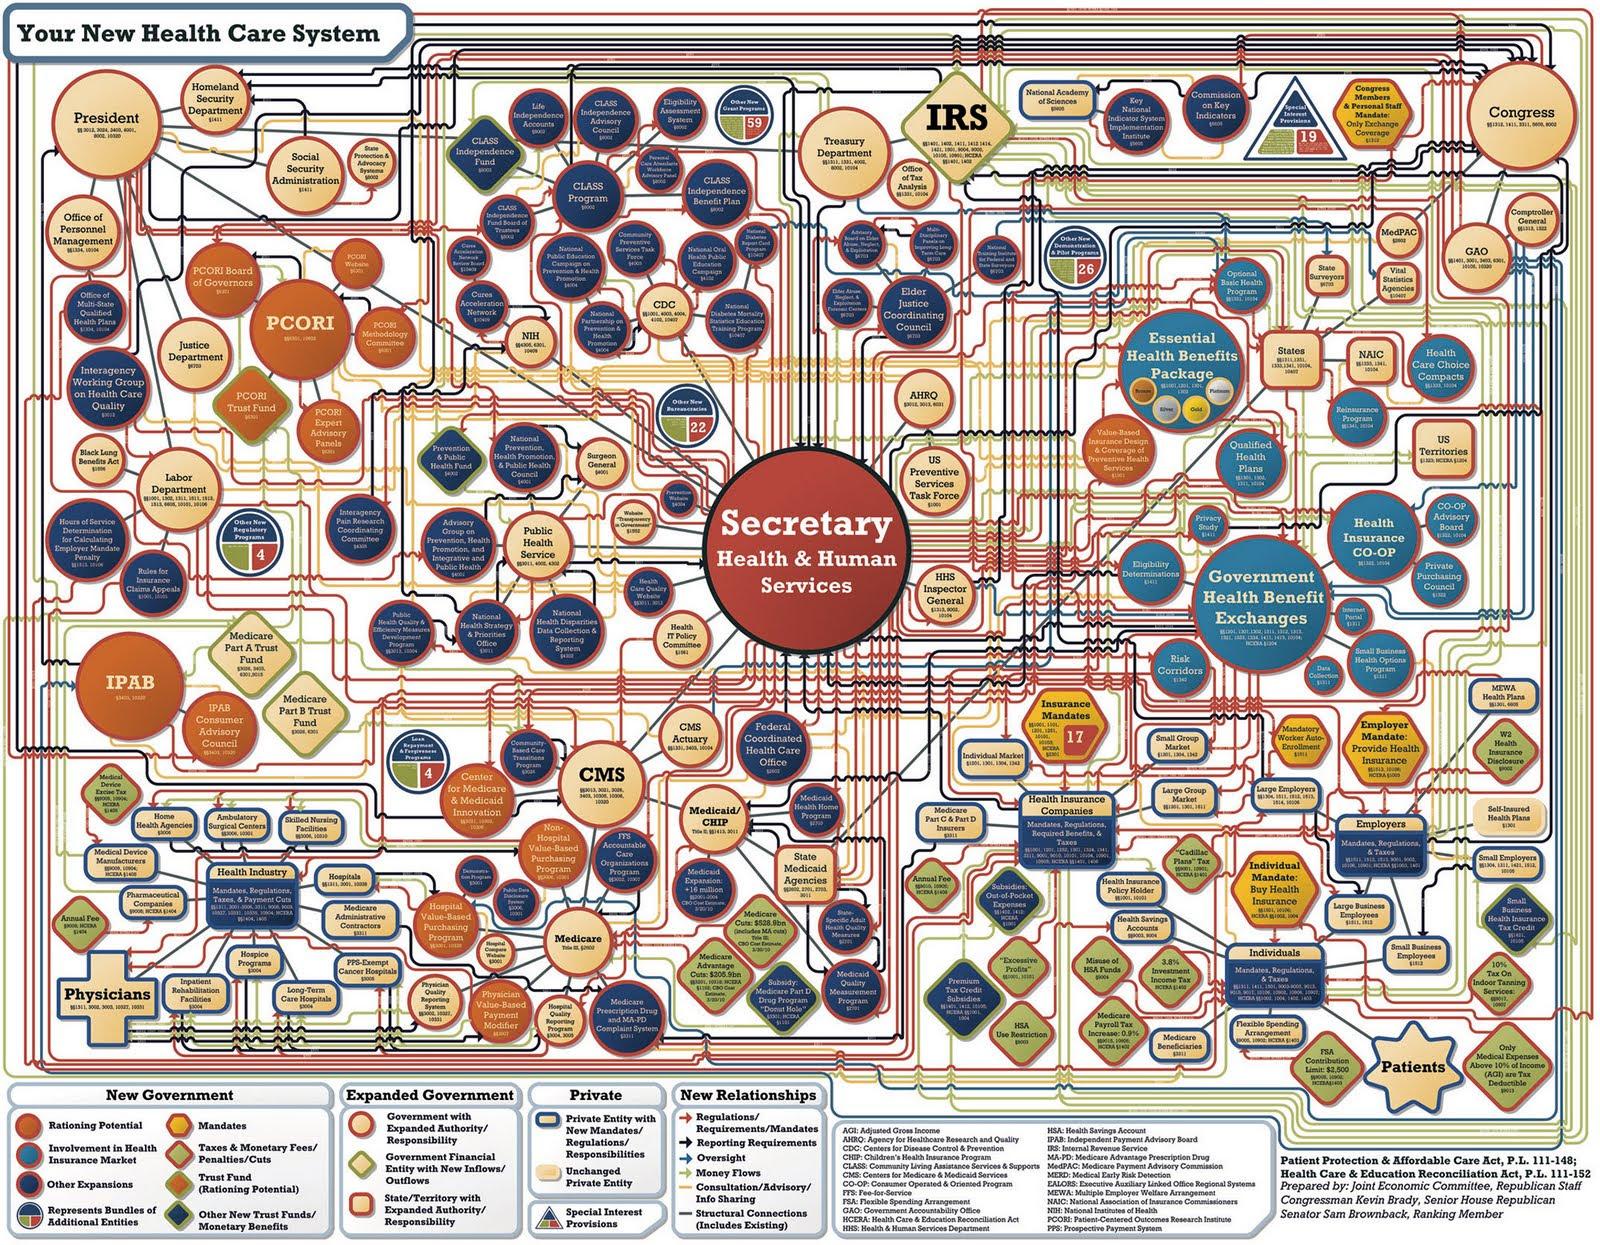 http://wichitaliberty.org/wp-content/uploads/2013/09/obamacare-chart.jpg